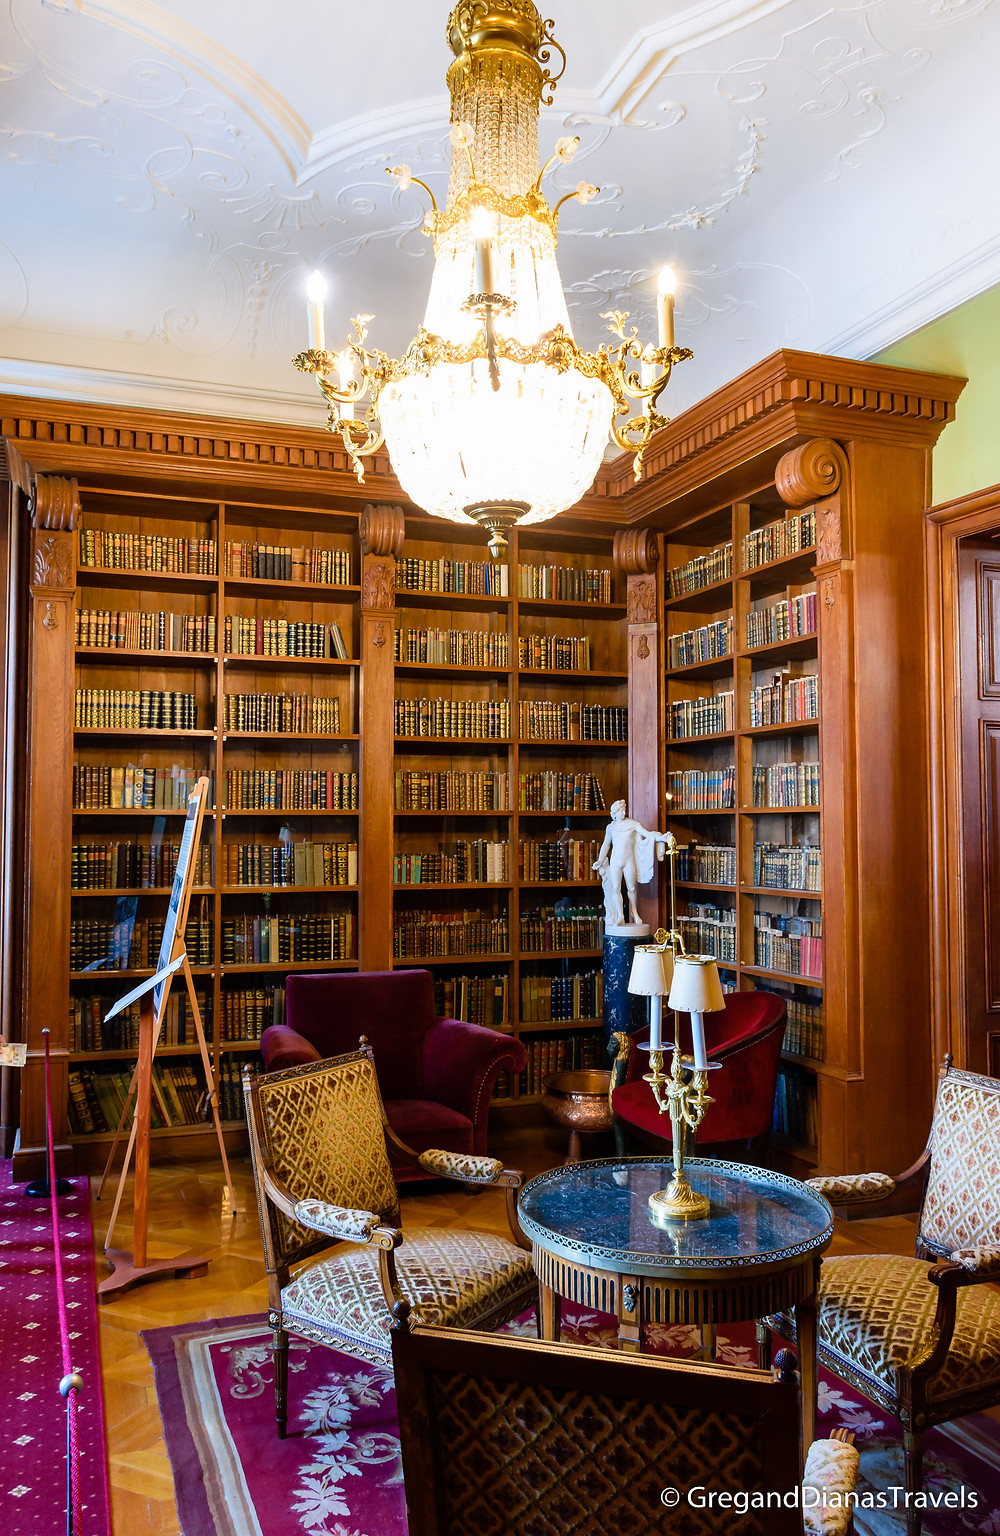 Helikon Library, Festetics Castle, Keszthely Hungary, Travel blog, Travel blogger, Travel photography